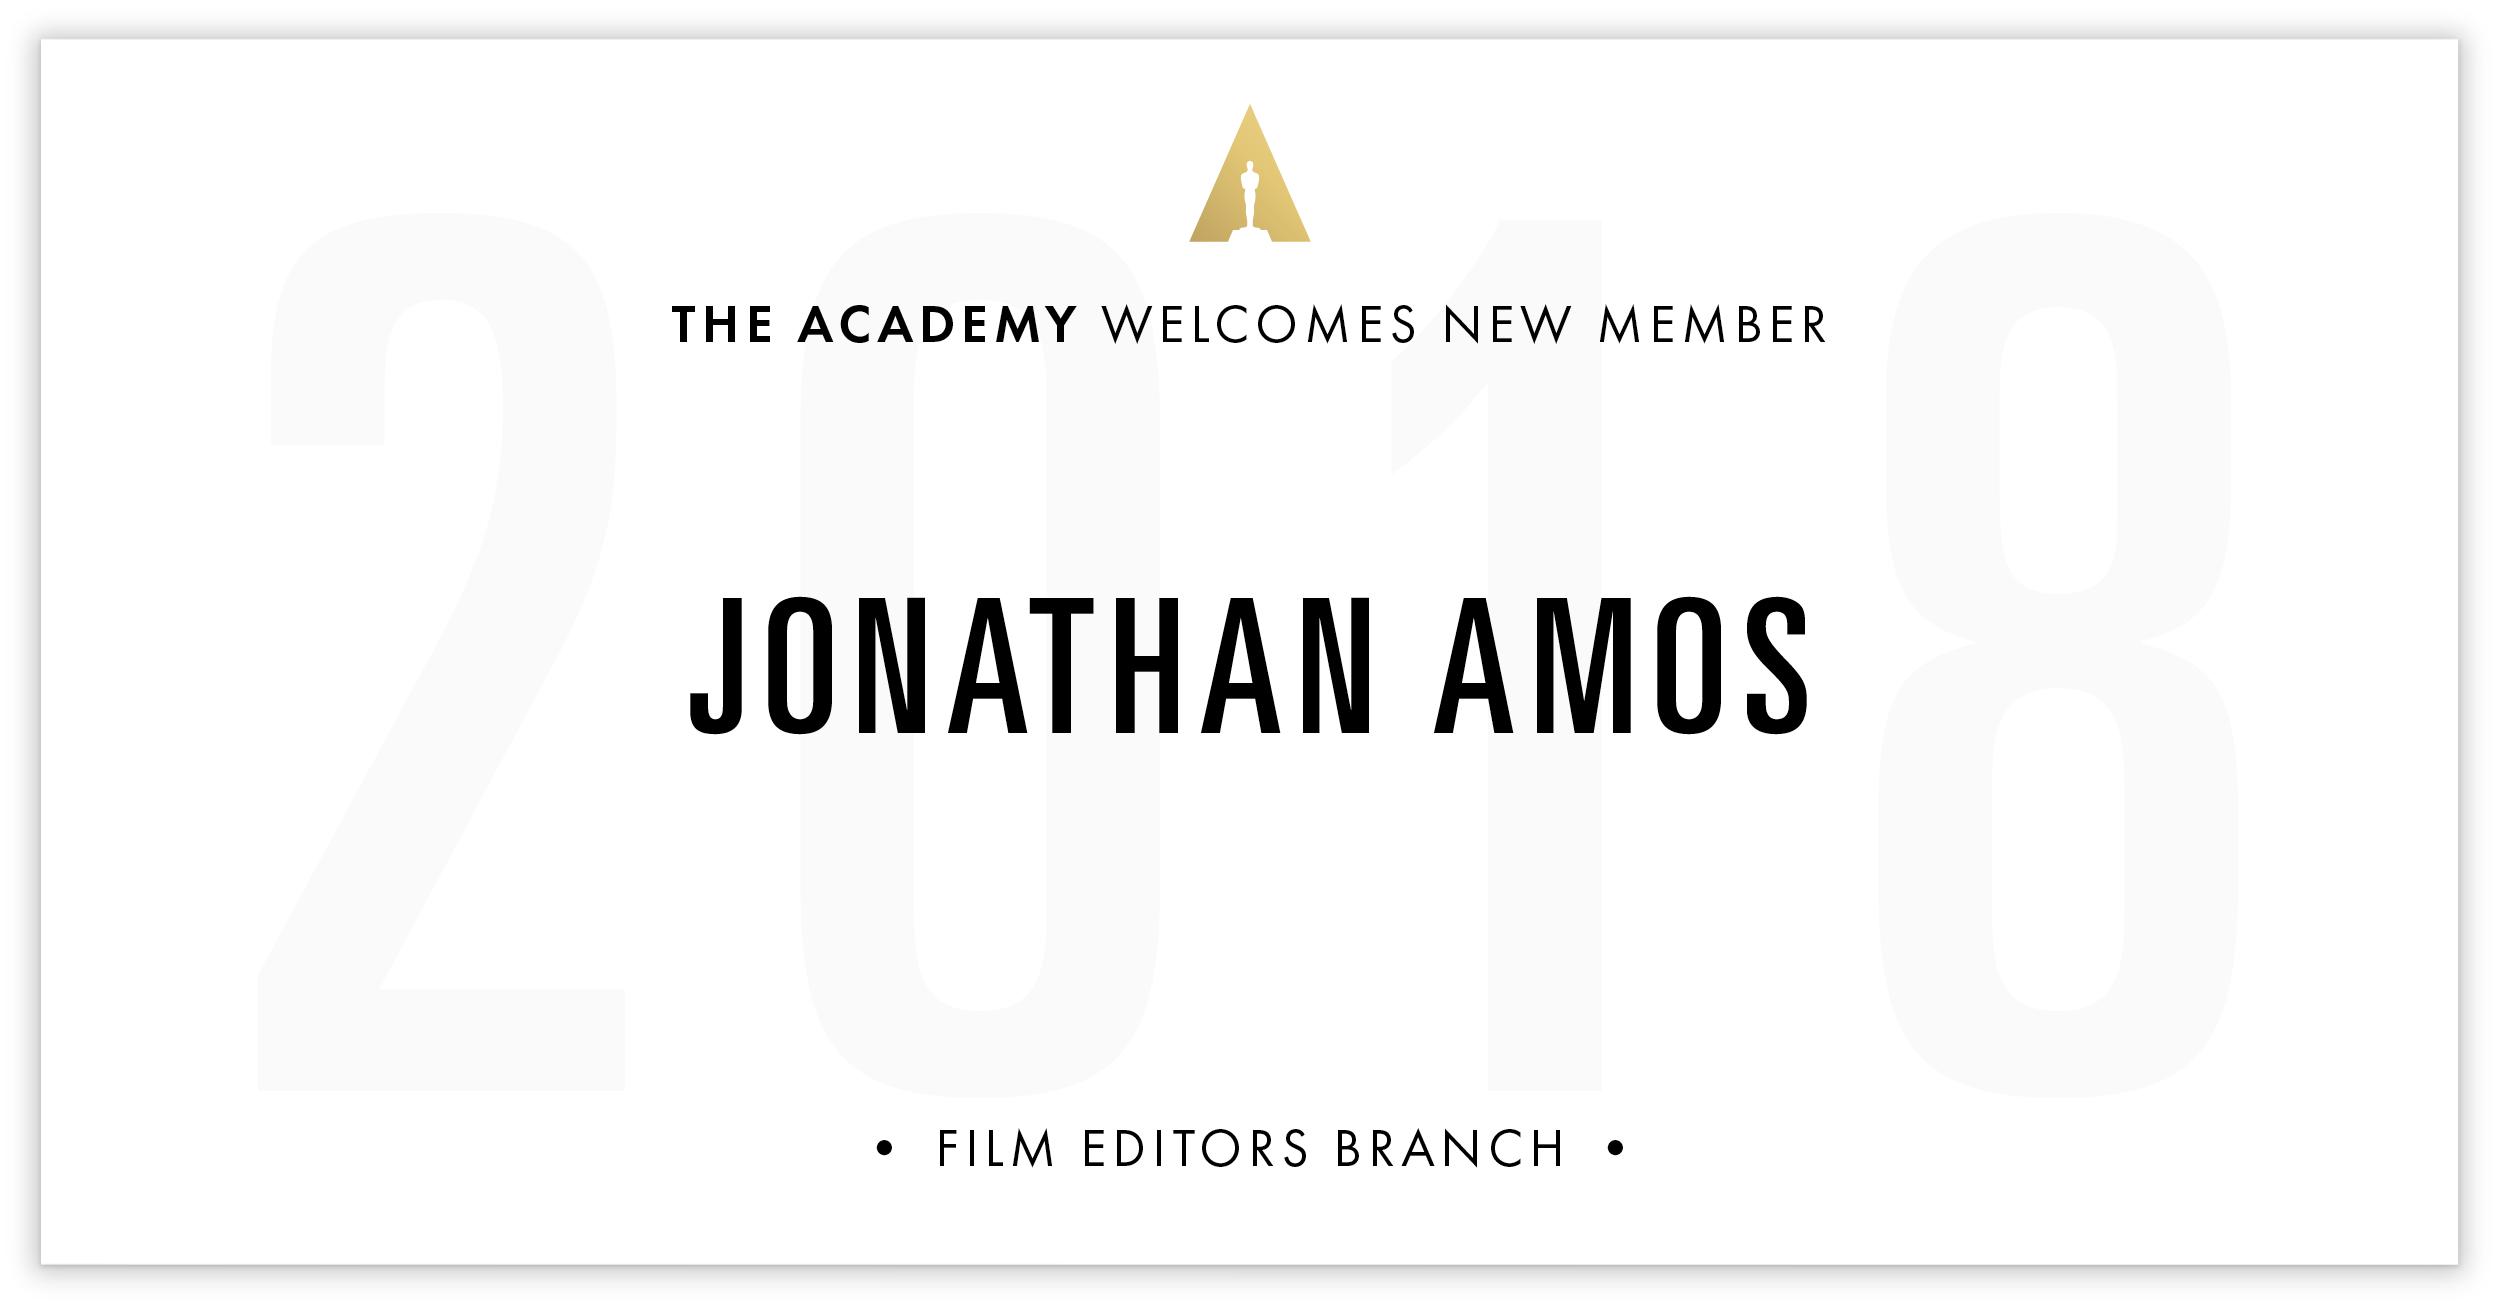 Jonathan Amos is invited!